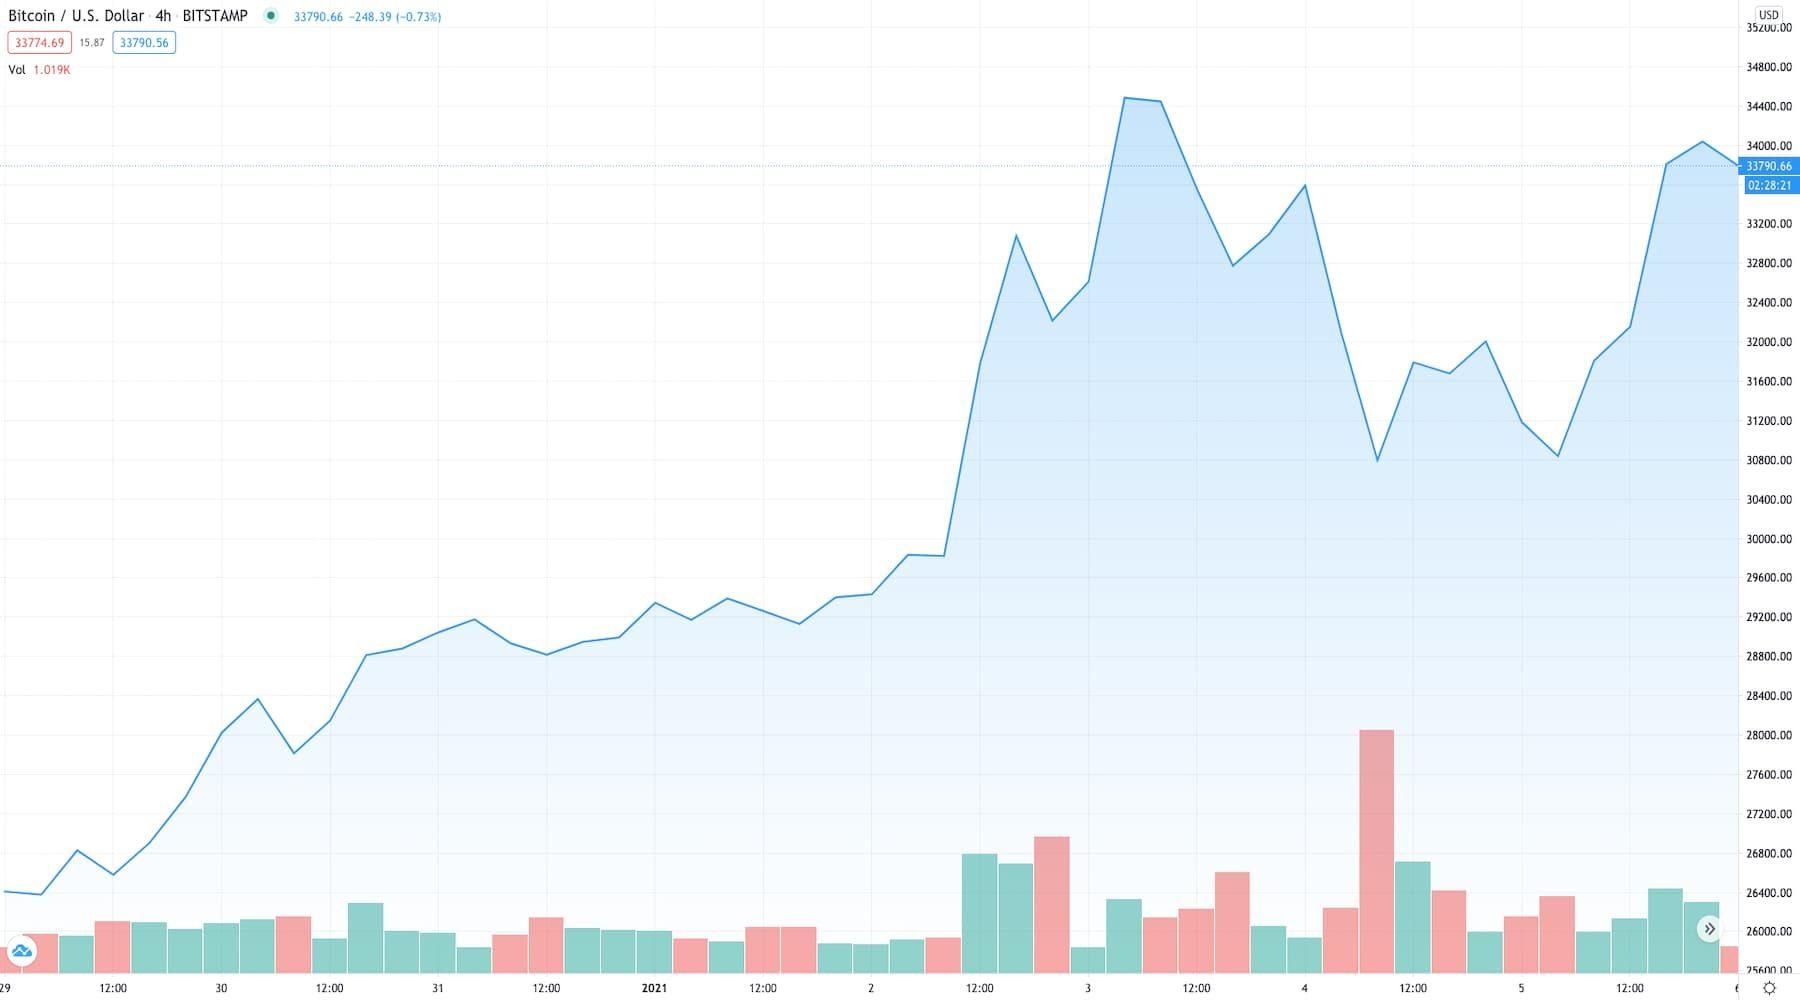 Bitcoin price update: Volatility peaks as price stalls